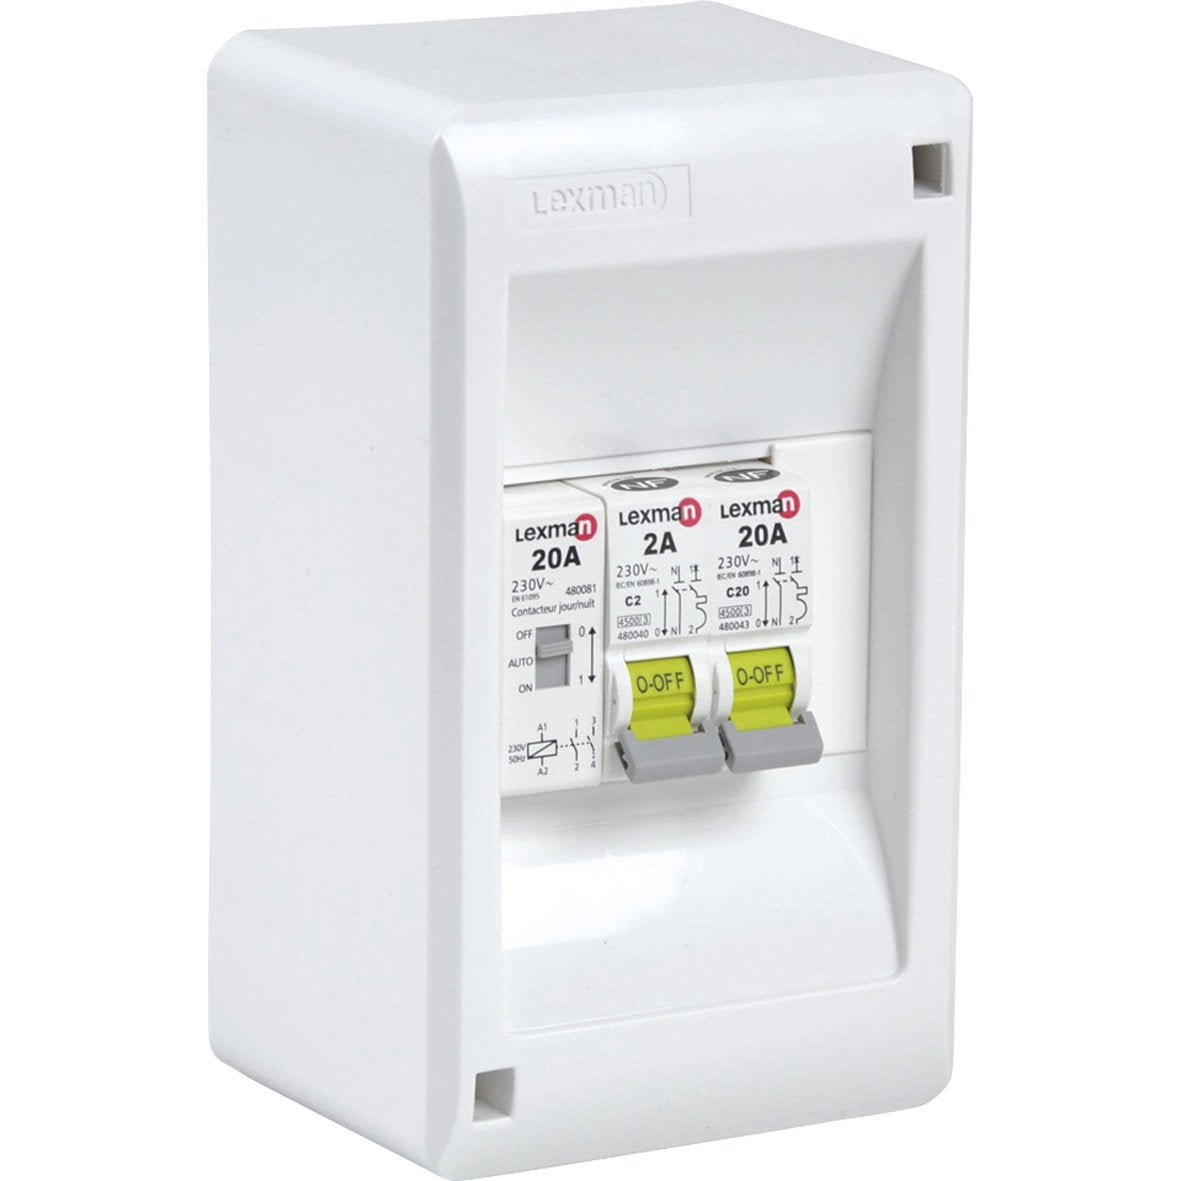 Tableau chauffe eau pr c bl lexman 1 rang e 4 modules for Isoler chauffe eau garage